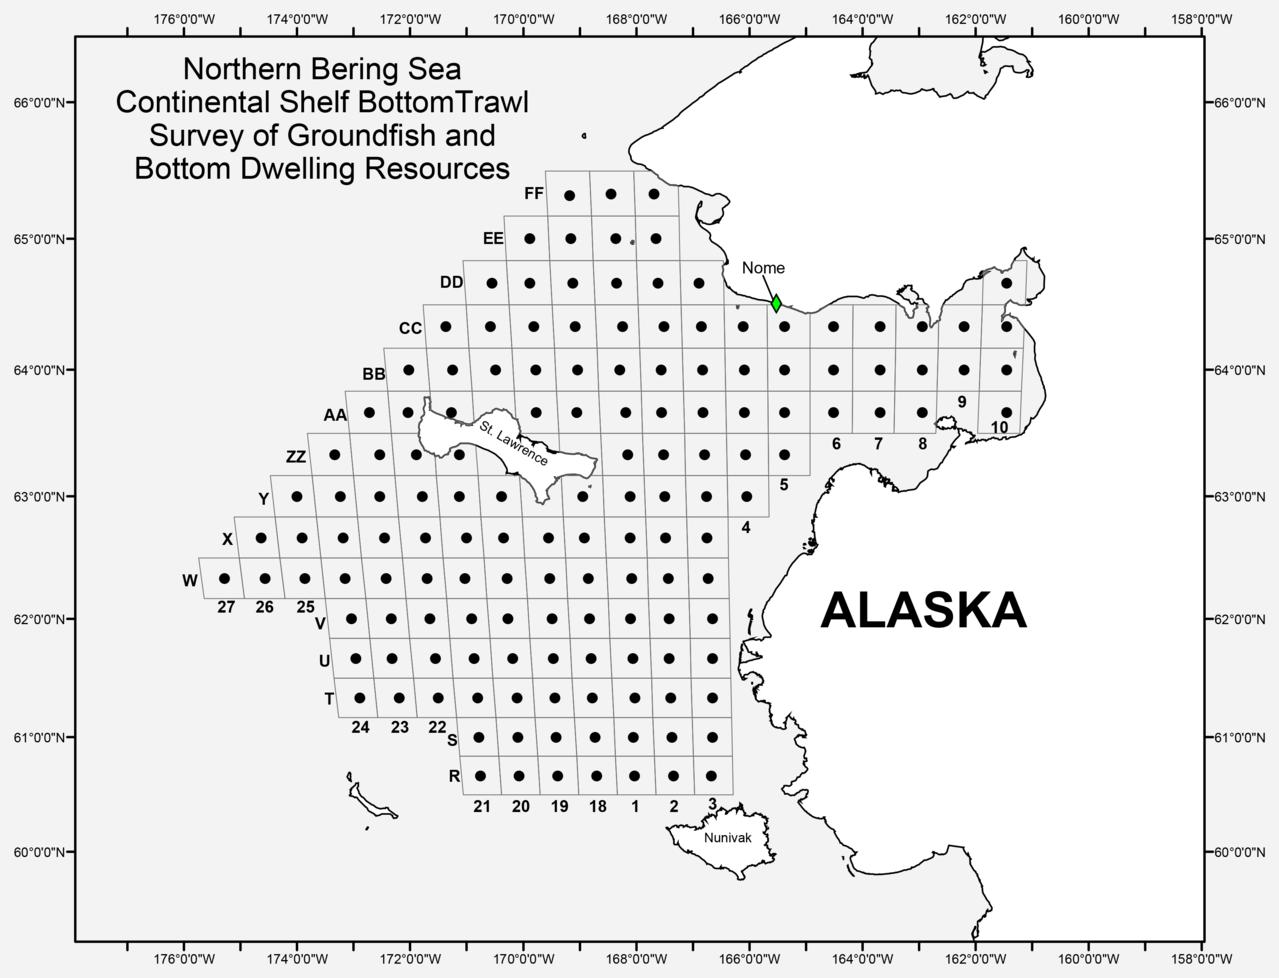 Northern Bering Sea Continental Shelf Bottom Trawl Survey of Groundfish and Bottom Dwelling Resources (map plot)